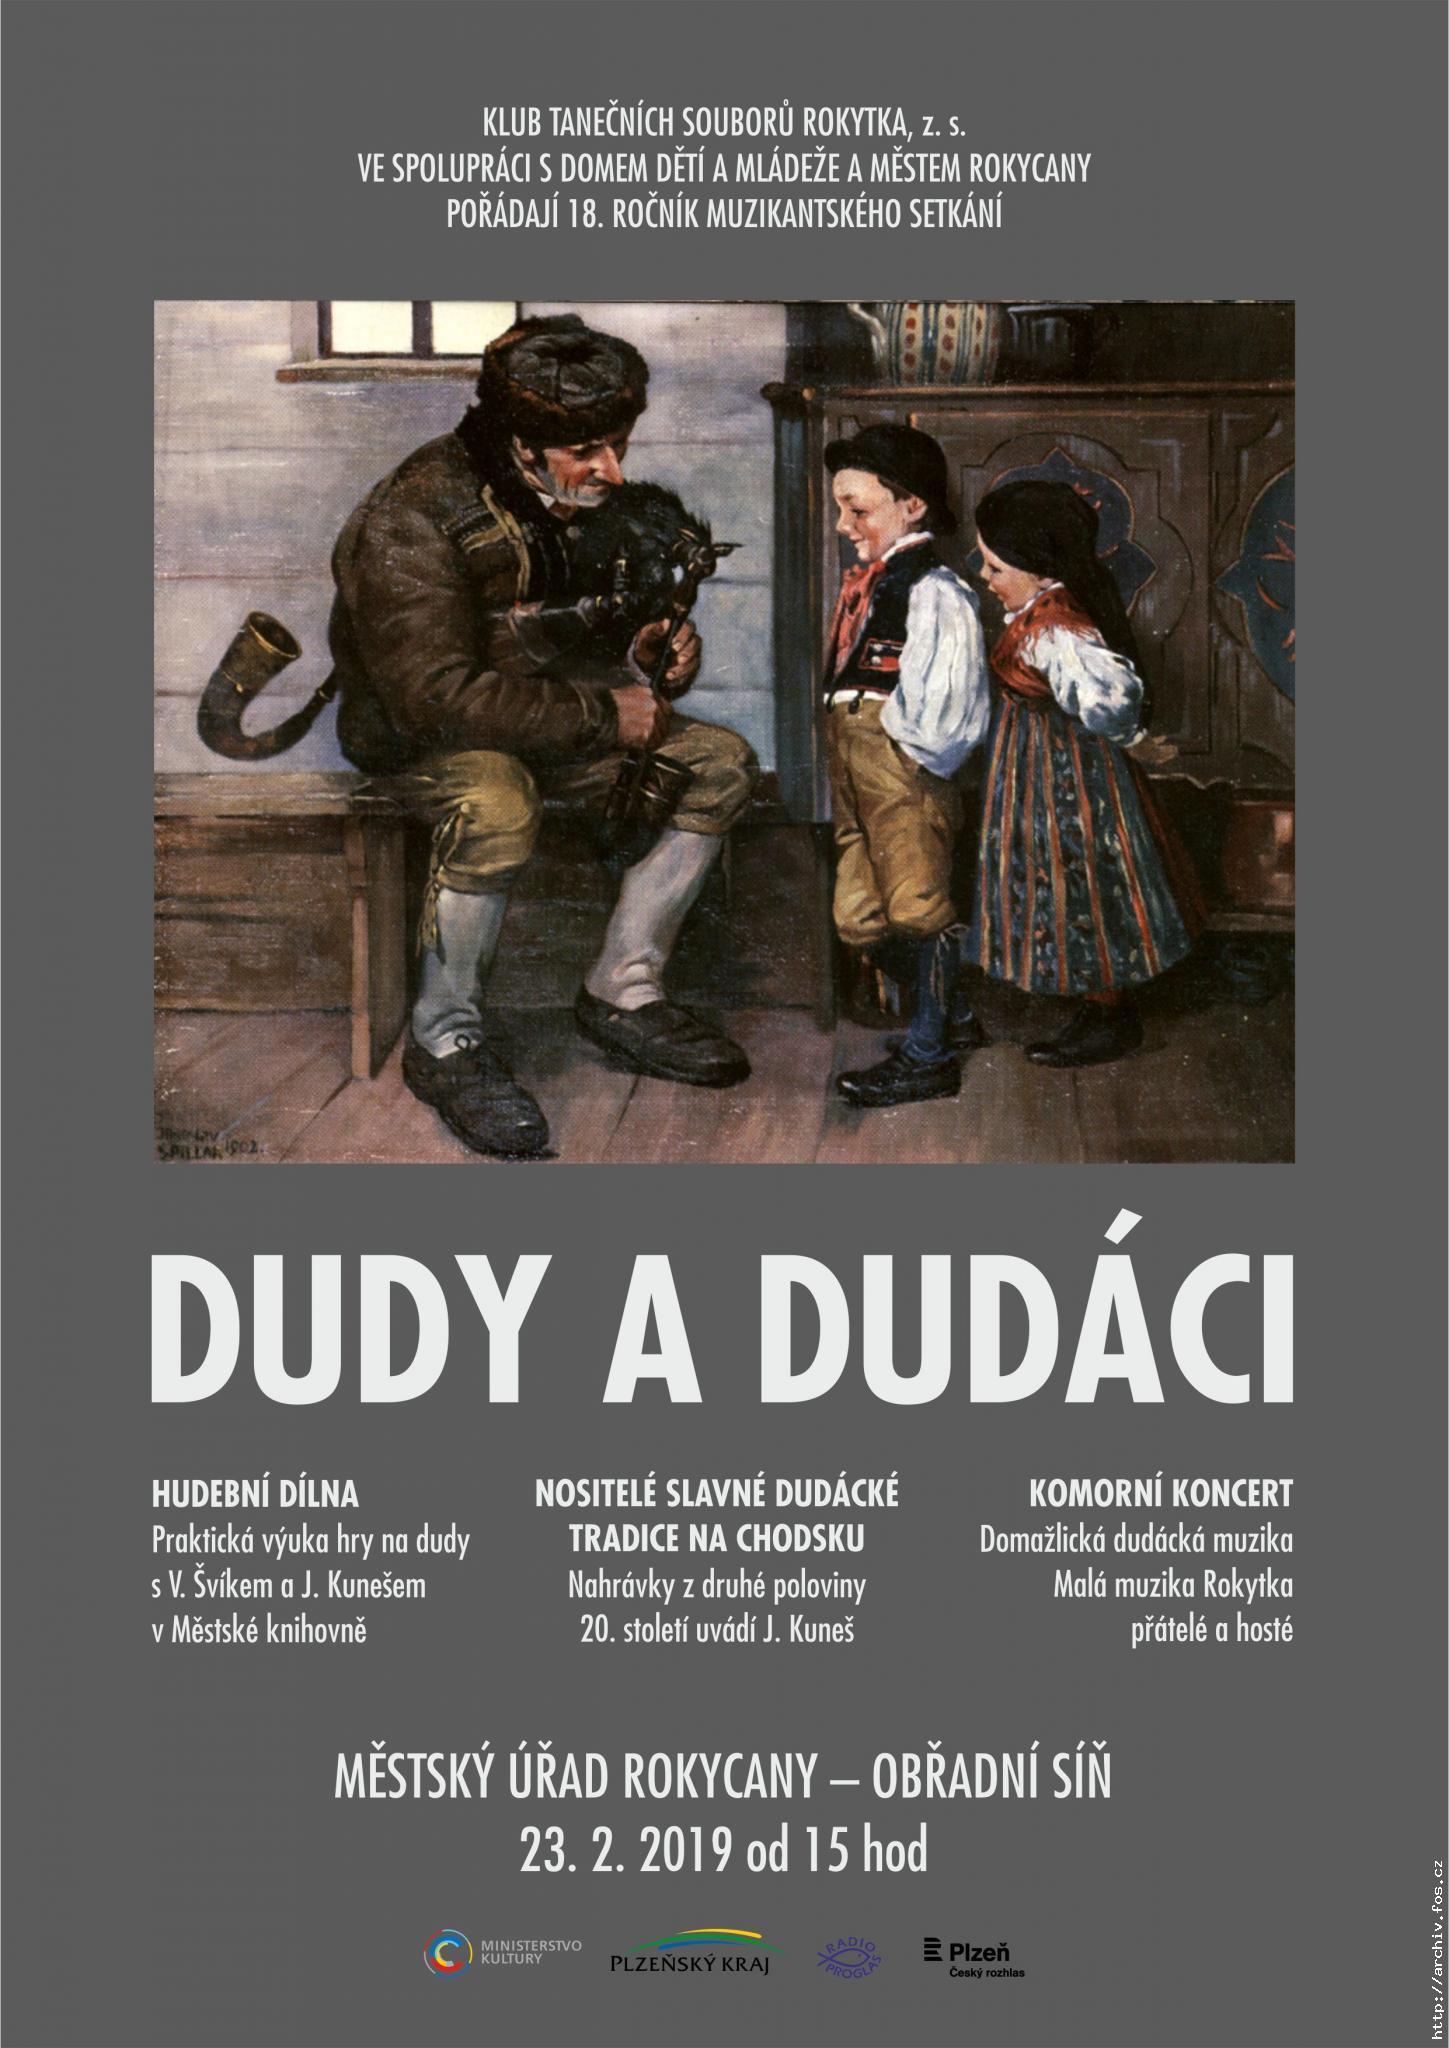 http://archiv.fos.cz/fotky/obr.php?name=dudaci-plakat-web.jpg&id=108132